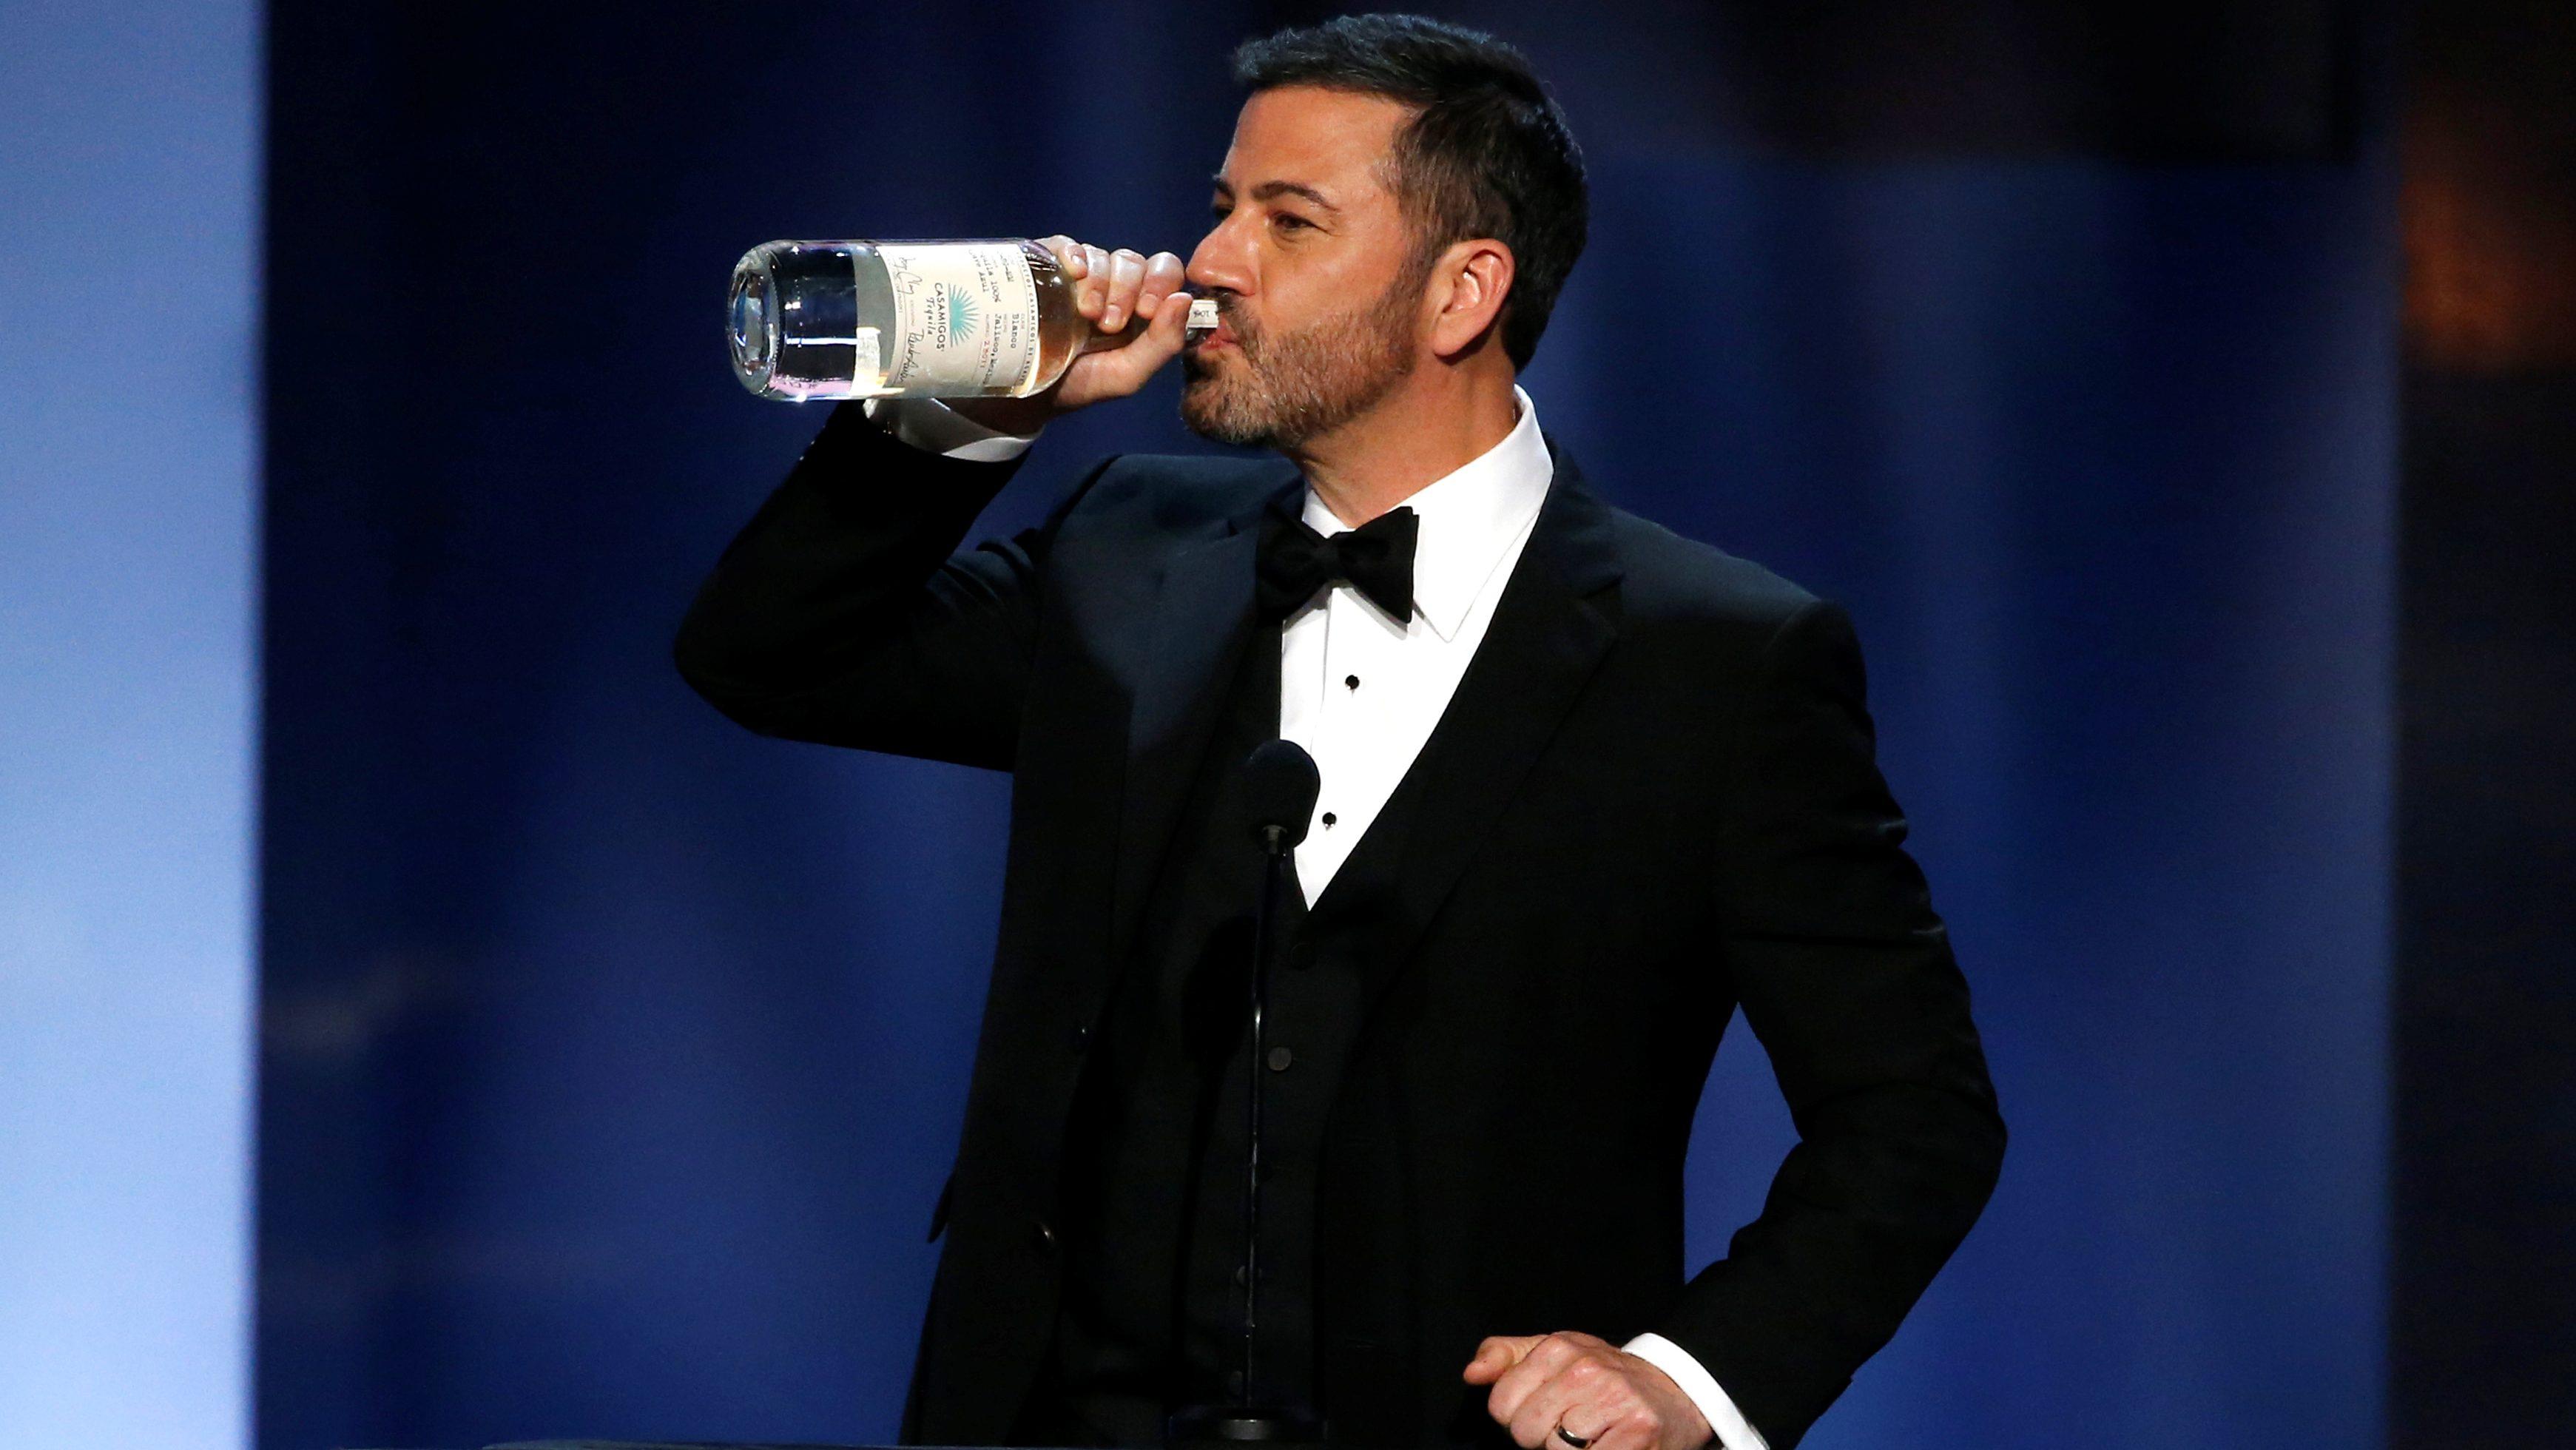 jimmy kimmel awards show host